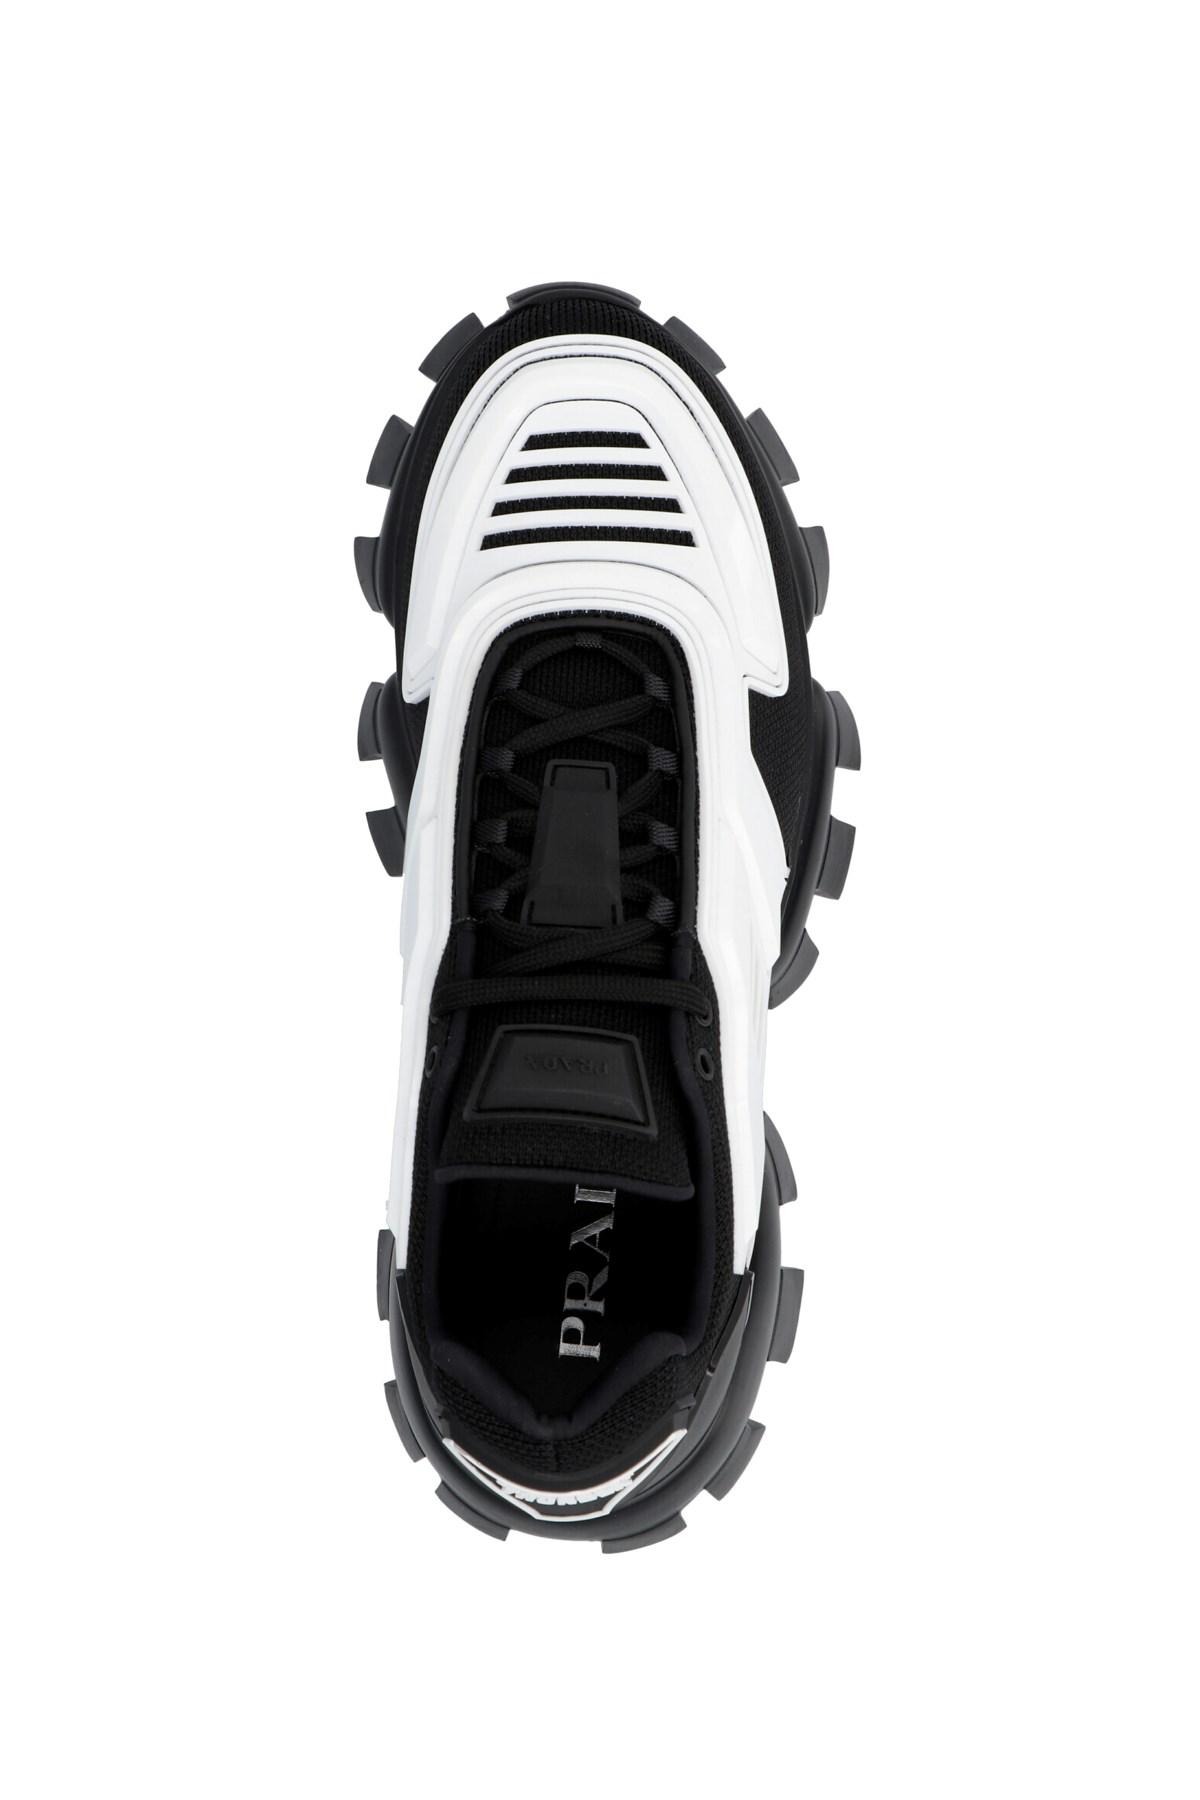 prada 'Cloudbust thunder' sneakers